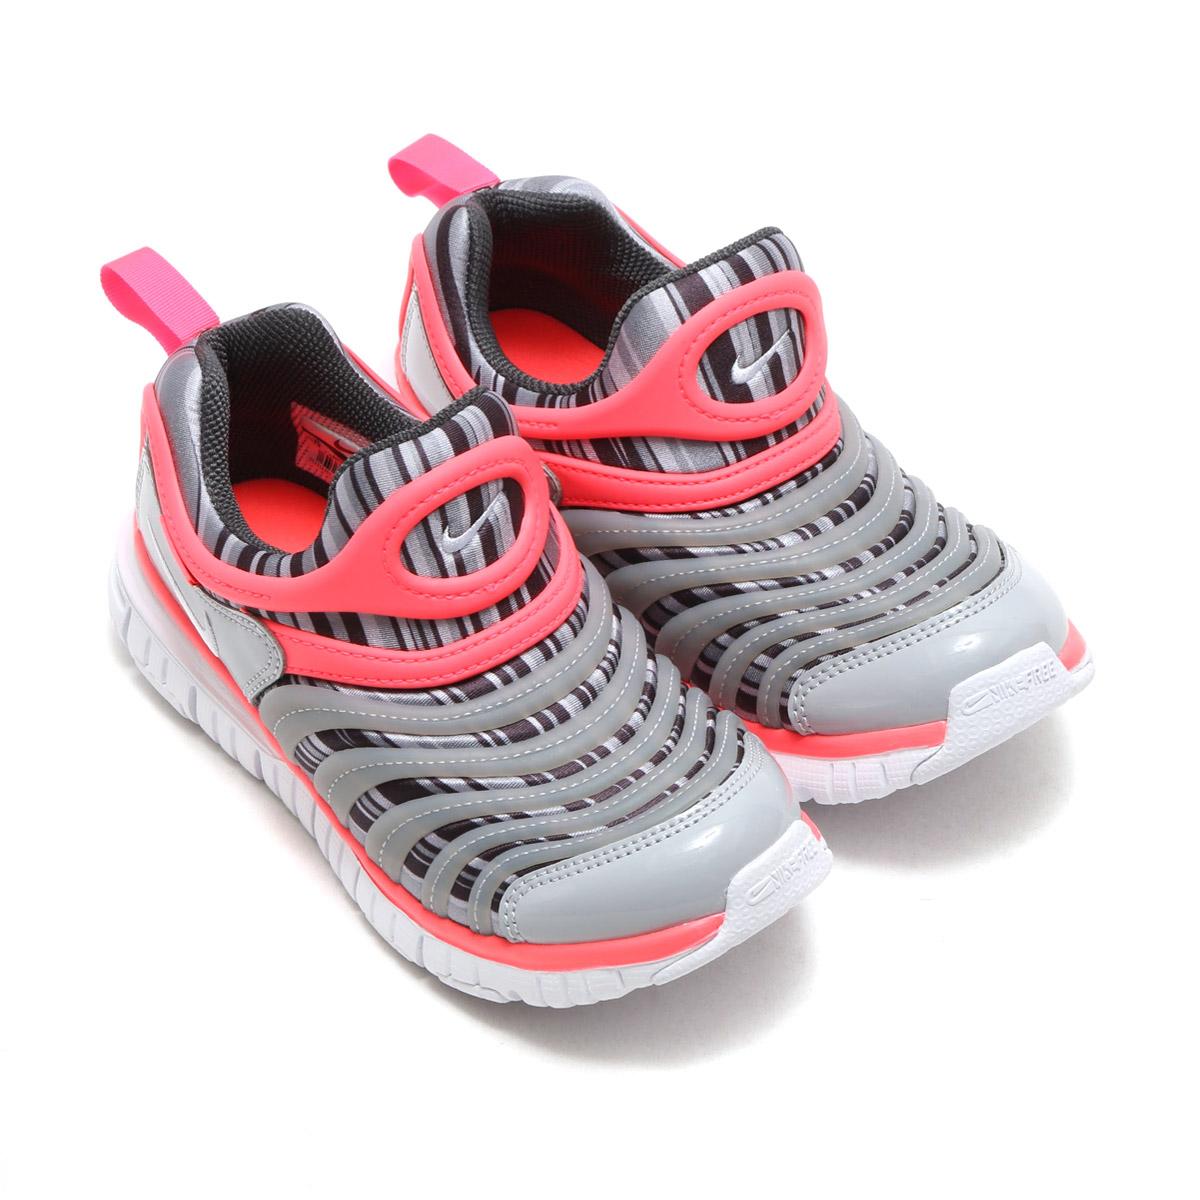 c6616426dac14 NIKE DYNAMO FREE PRINT (PS) (Nike dynamo-free print PS) ANTHRACITE WHITE-HOT  PUNCH-WOLF GREY 17FA-I